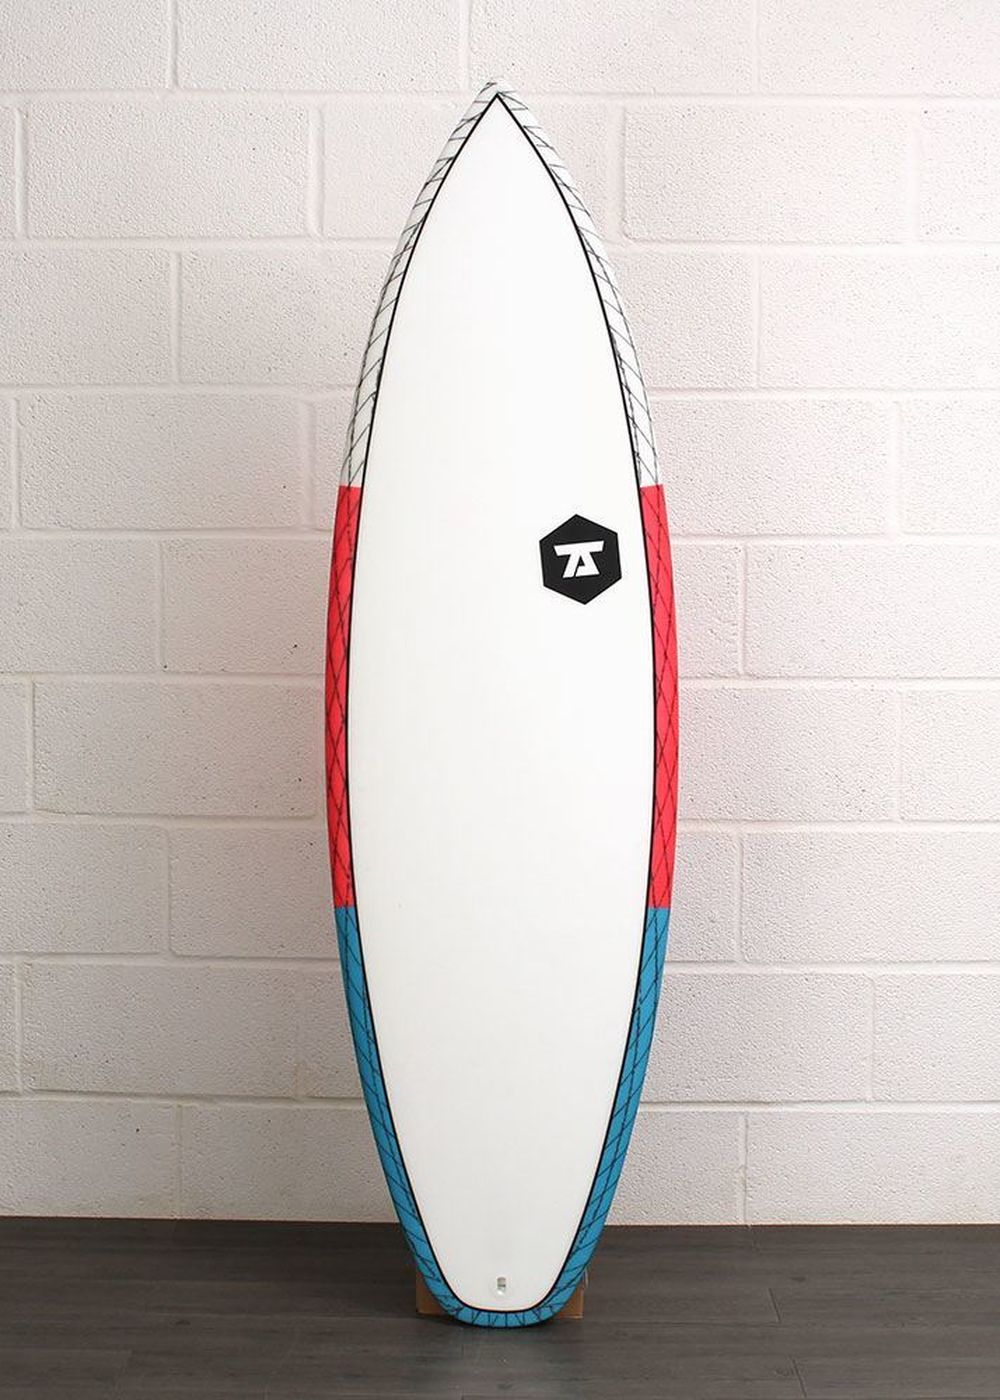 7S SALT SHAKER CV SURFBOARD 5ft 10 Maroon/Blue